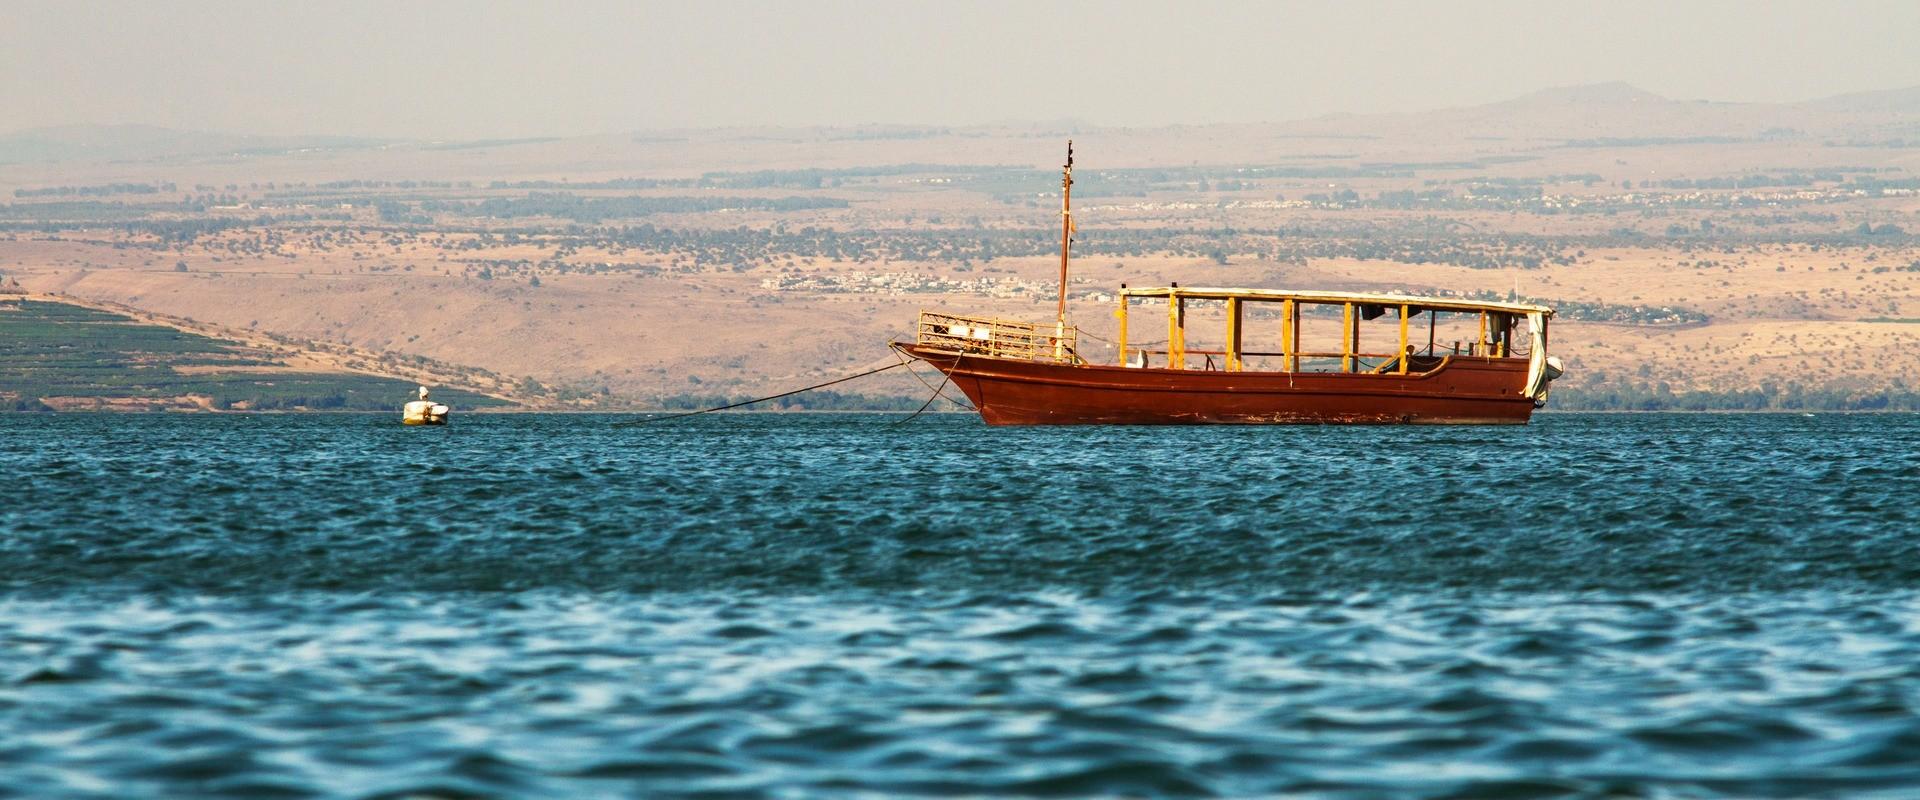 Sea of Galilee Boat ride